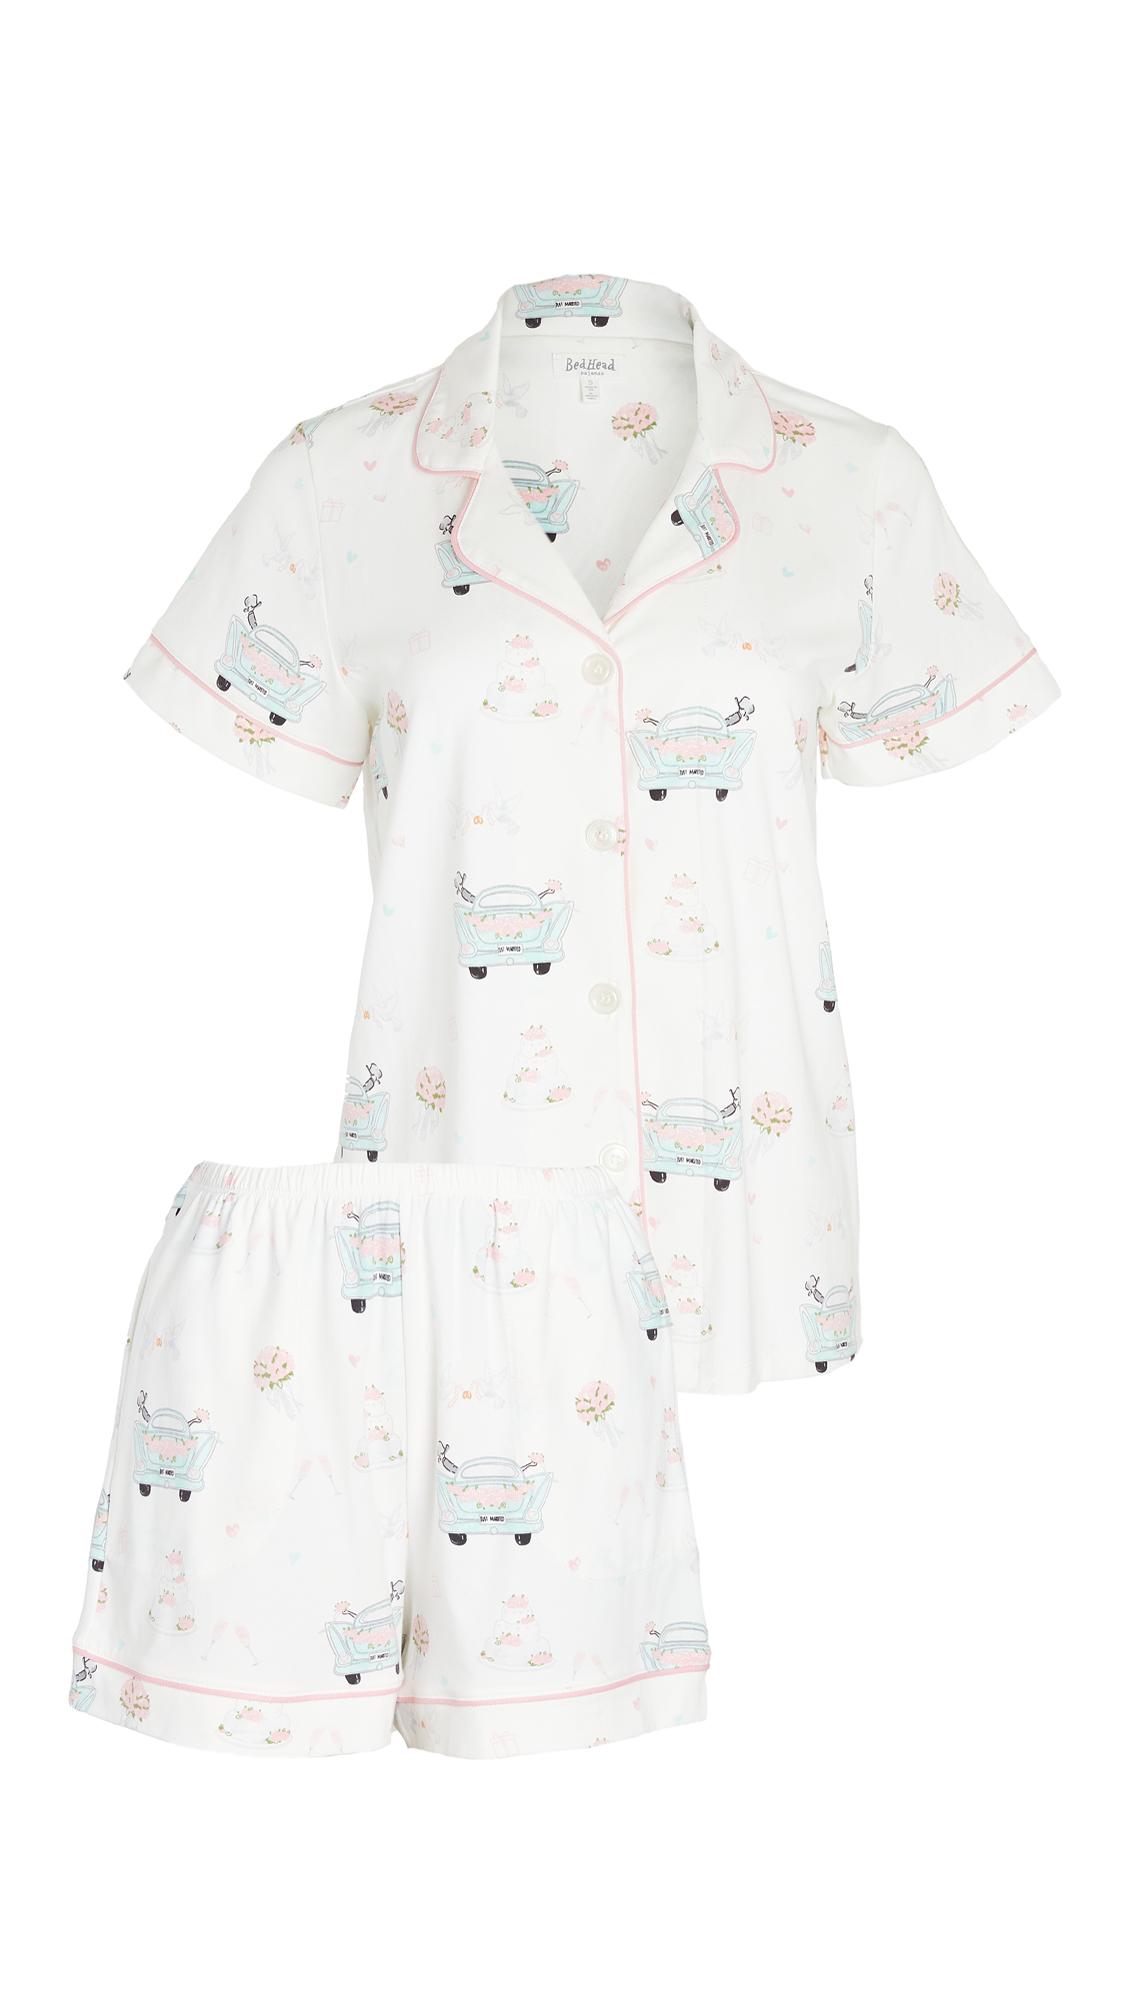 BedHead Pajamas Just Married Short Sleeve Classic Shorty PJ Set